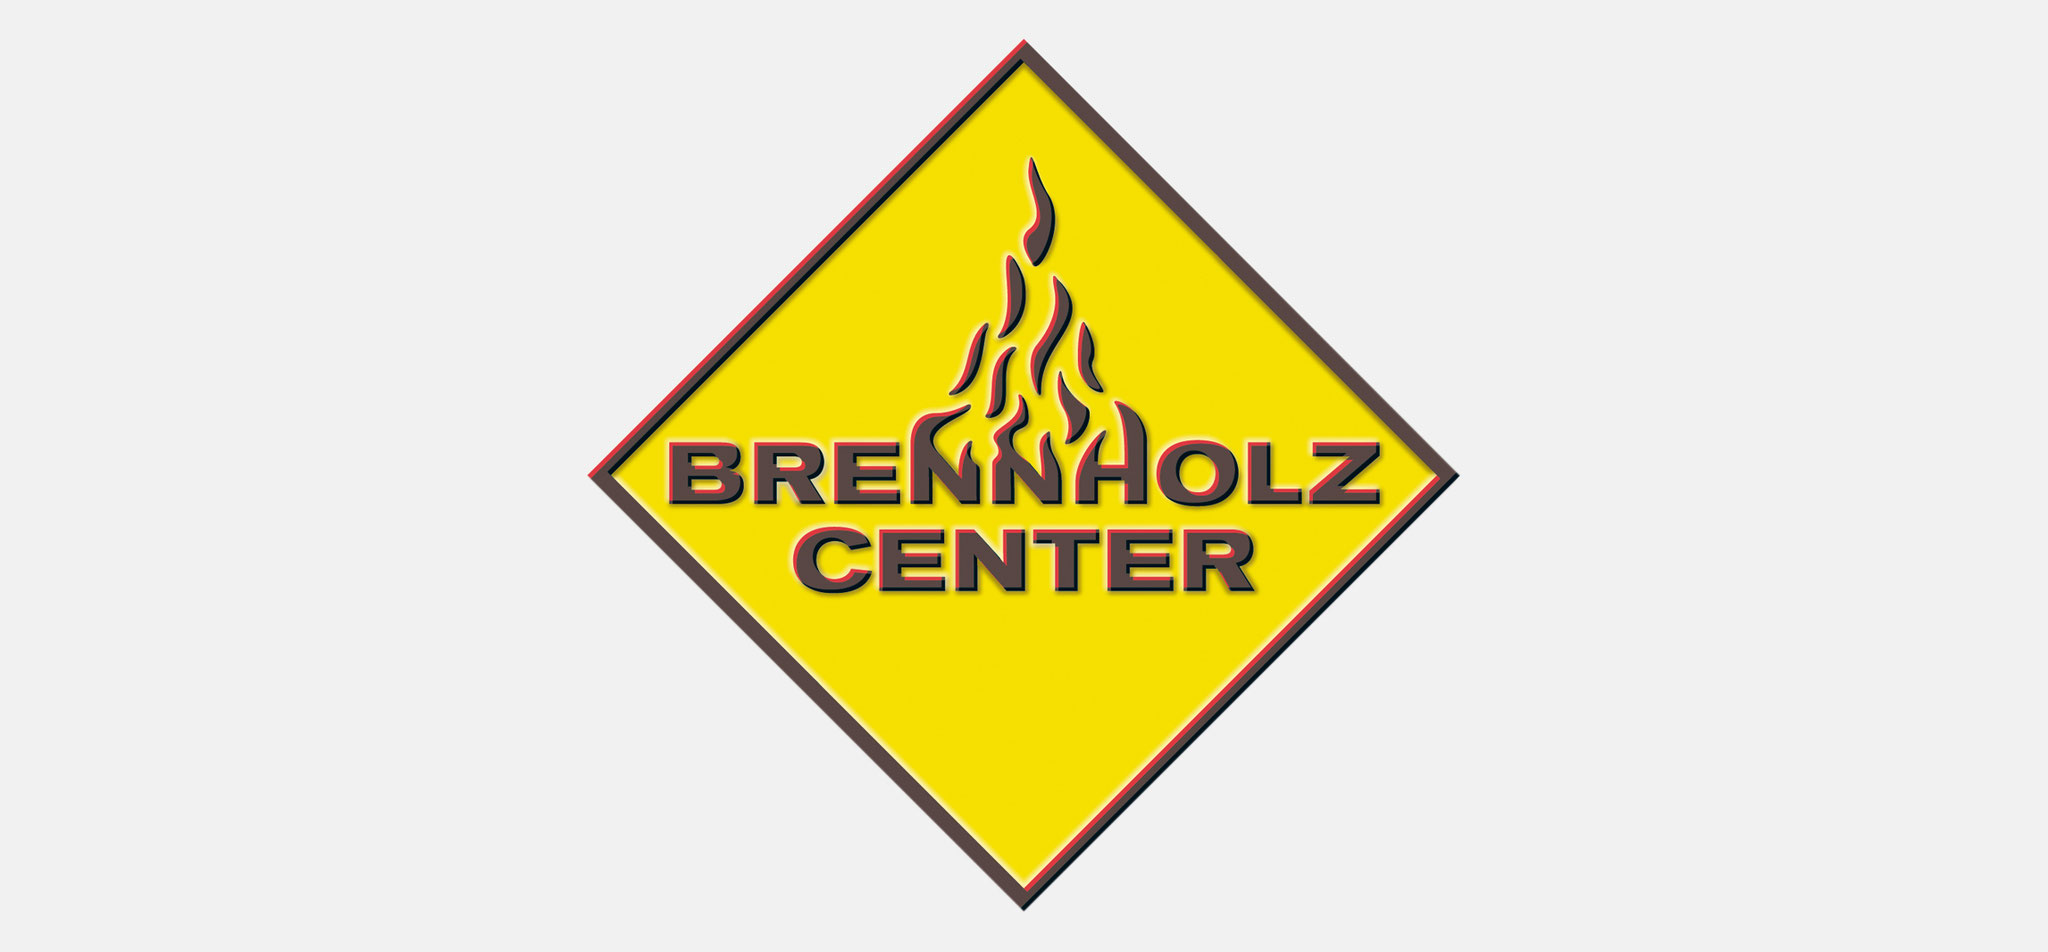 BRENNHOLZCENTER | logo bhc, 3D – infragrau, gute gestaltung